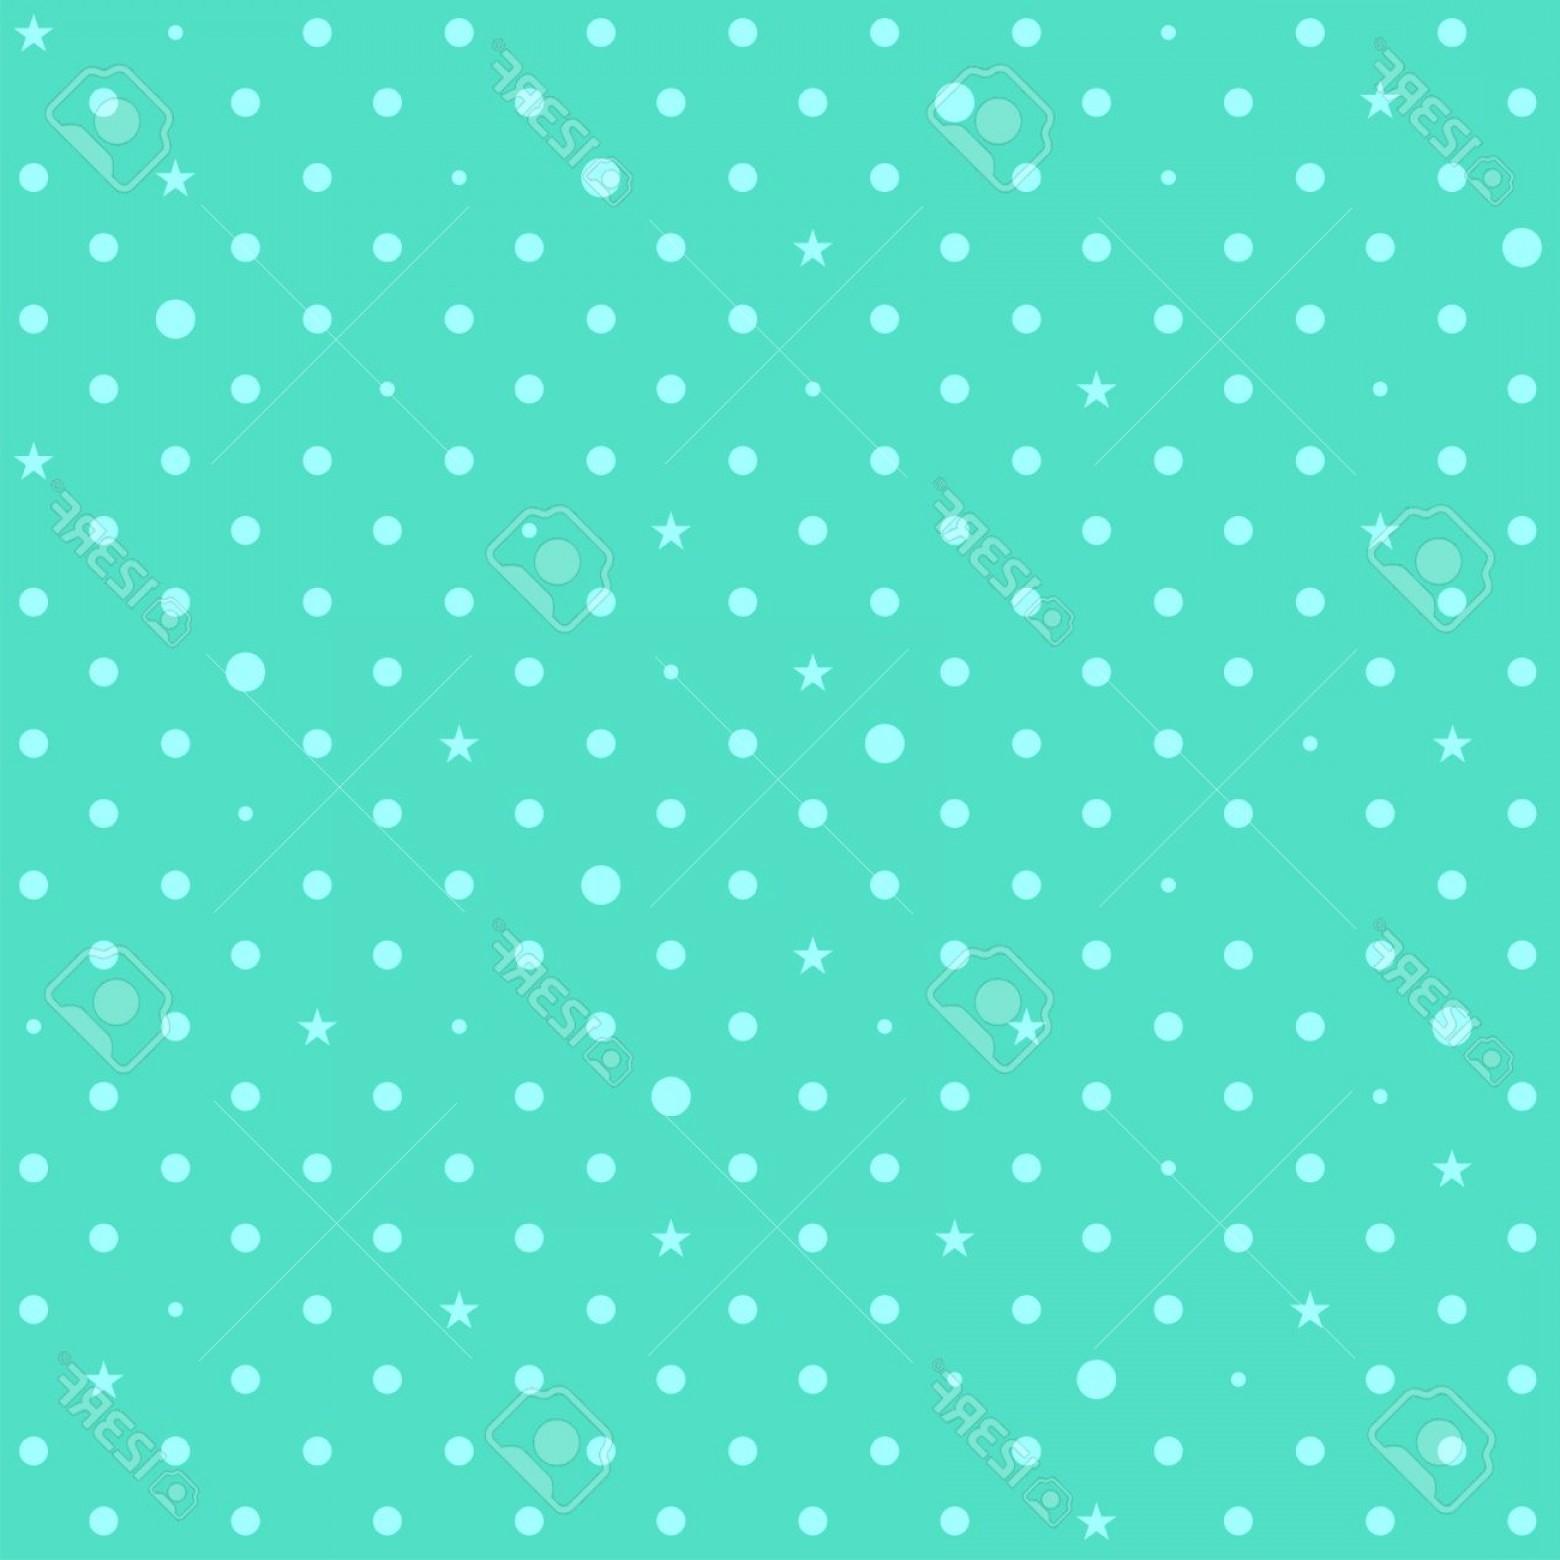 1560x1560 Photostock Vector Blue Green Mint Star Polka Dots Background